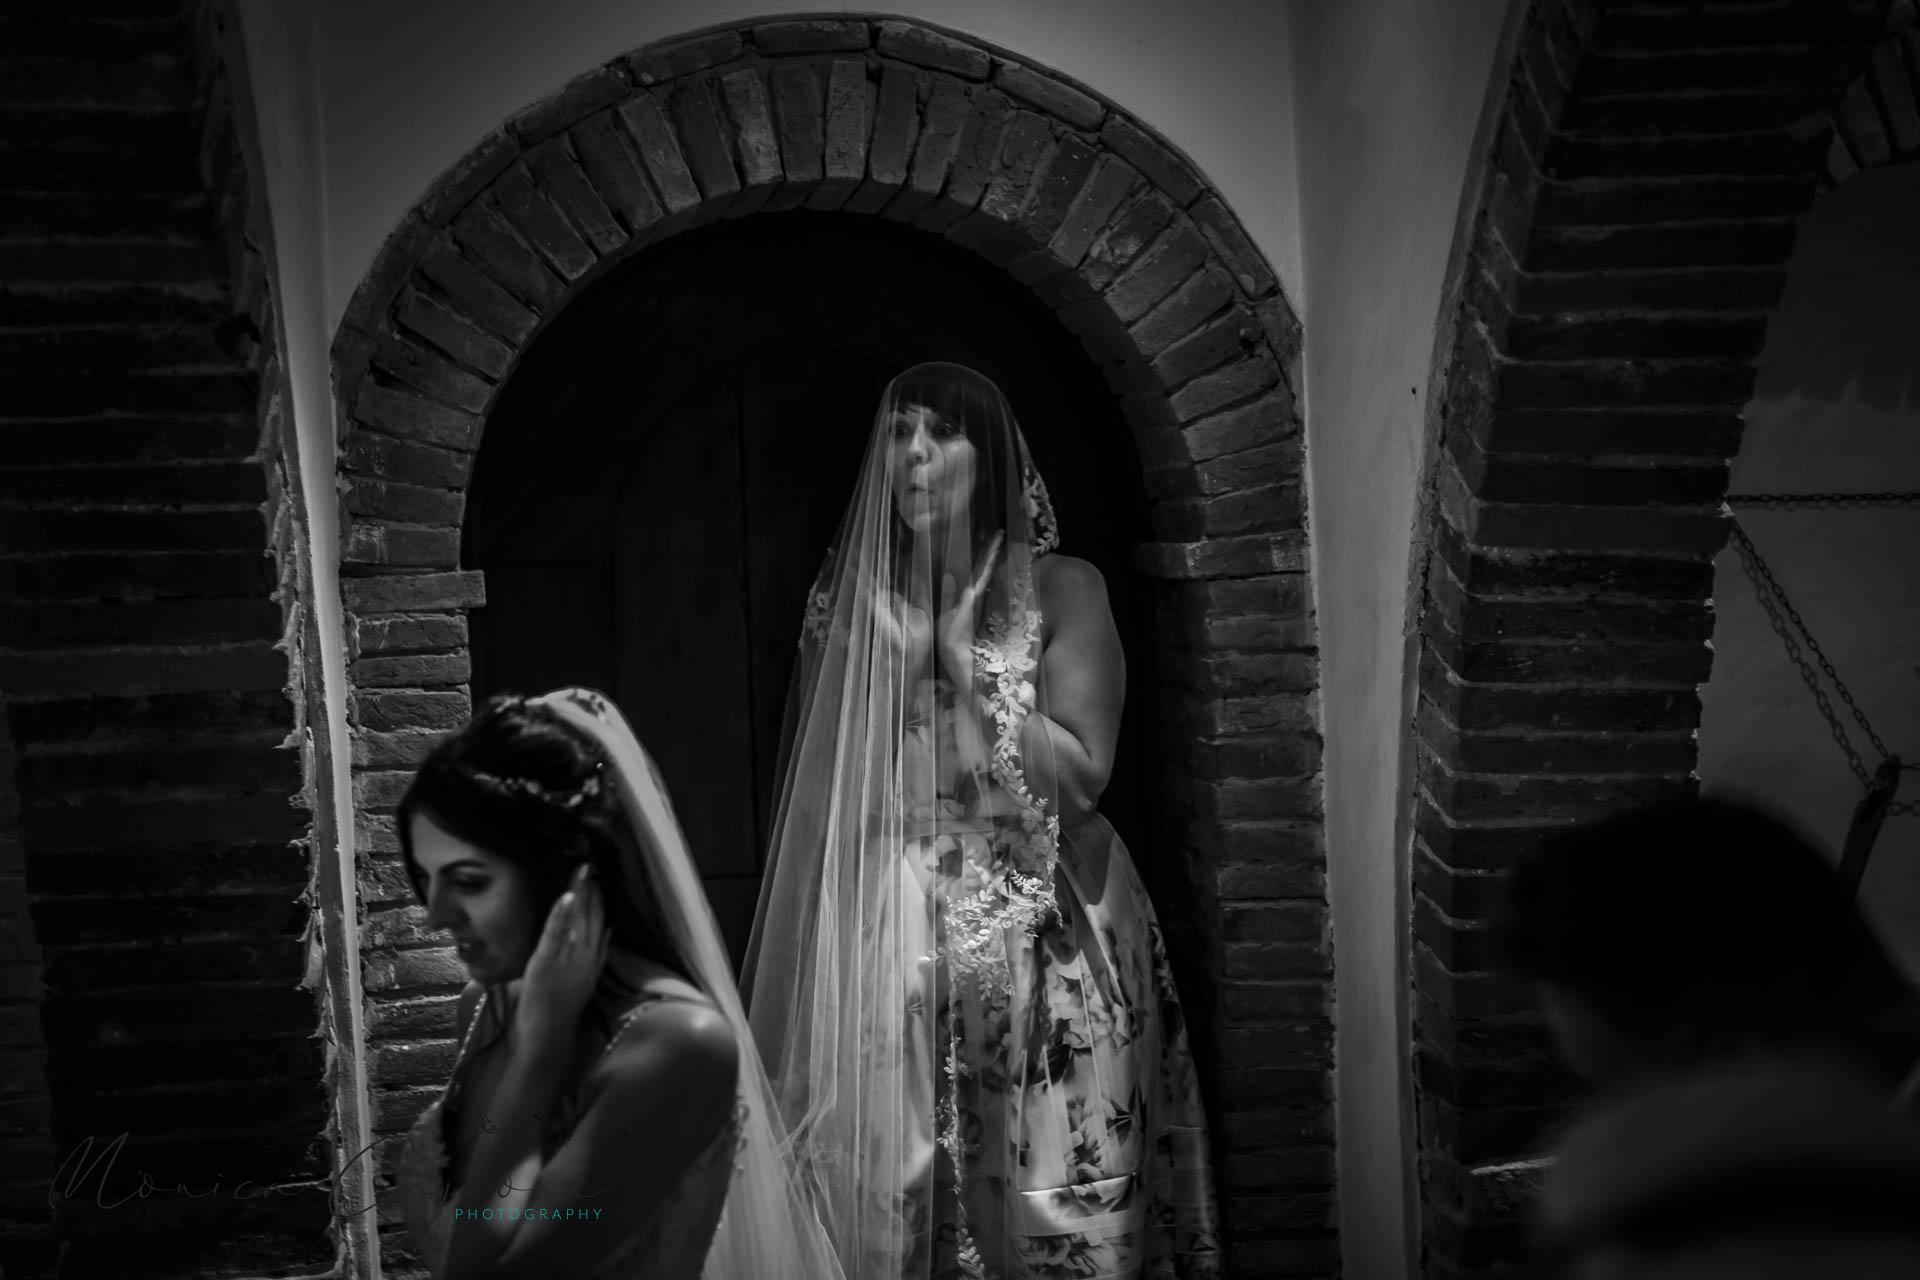 prezzi-servizio-fotografico-matrimonio-siena